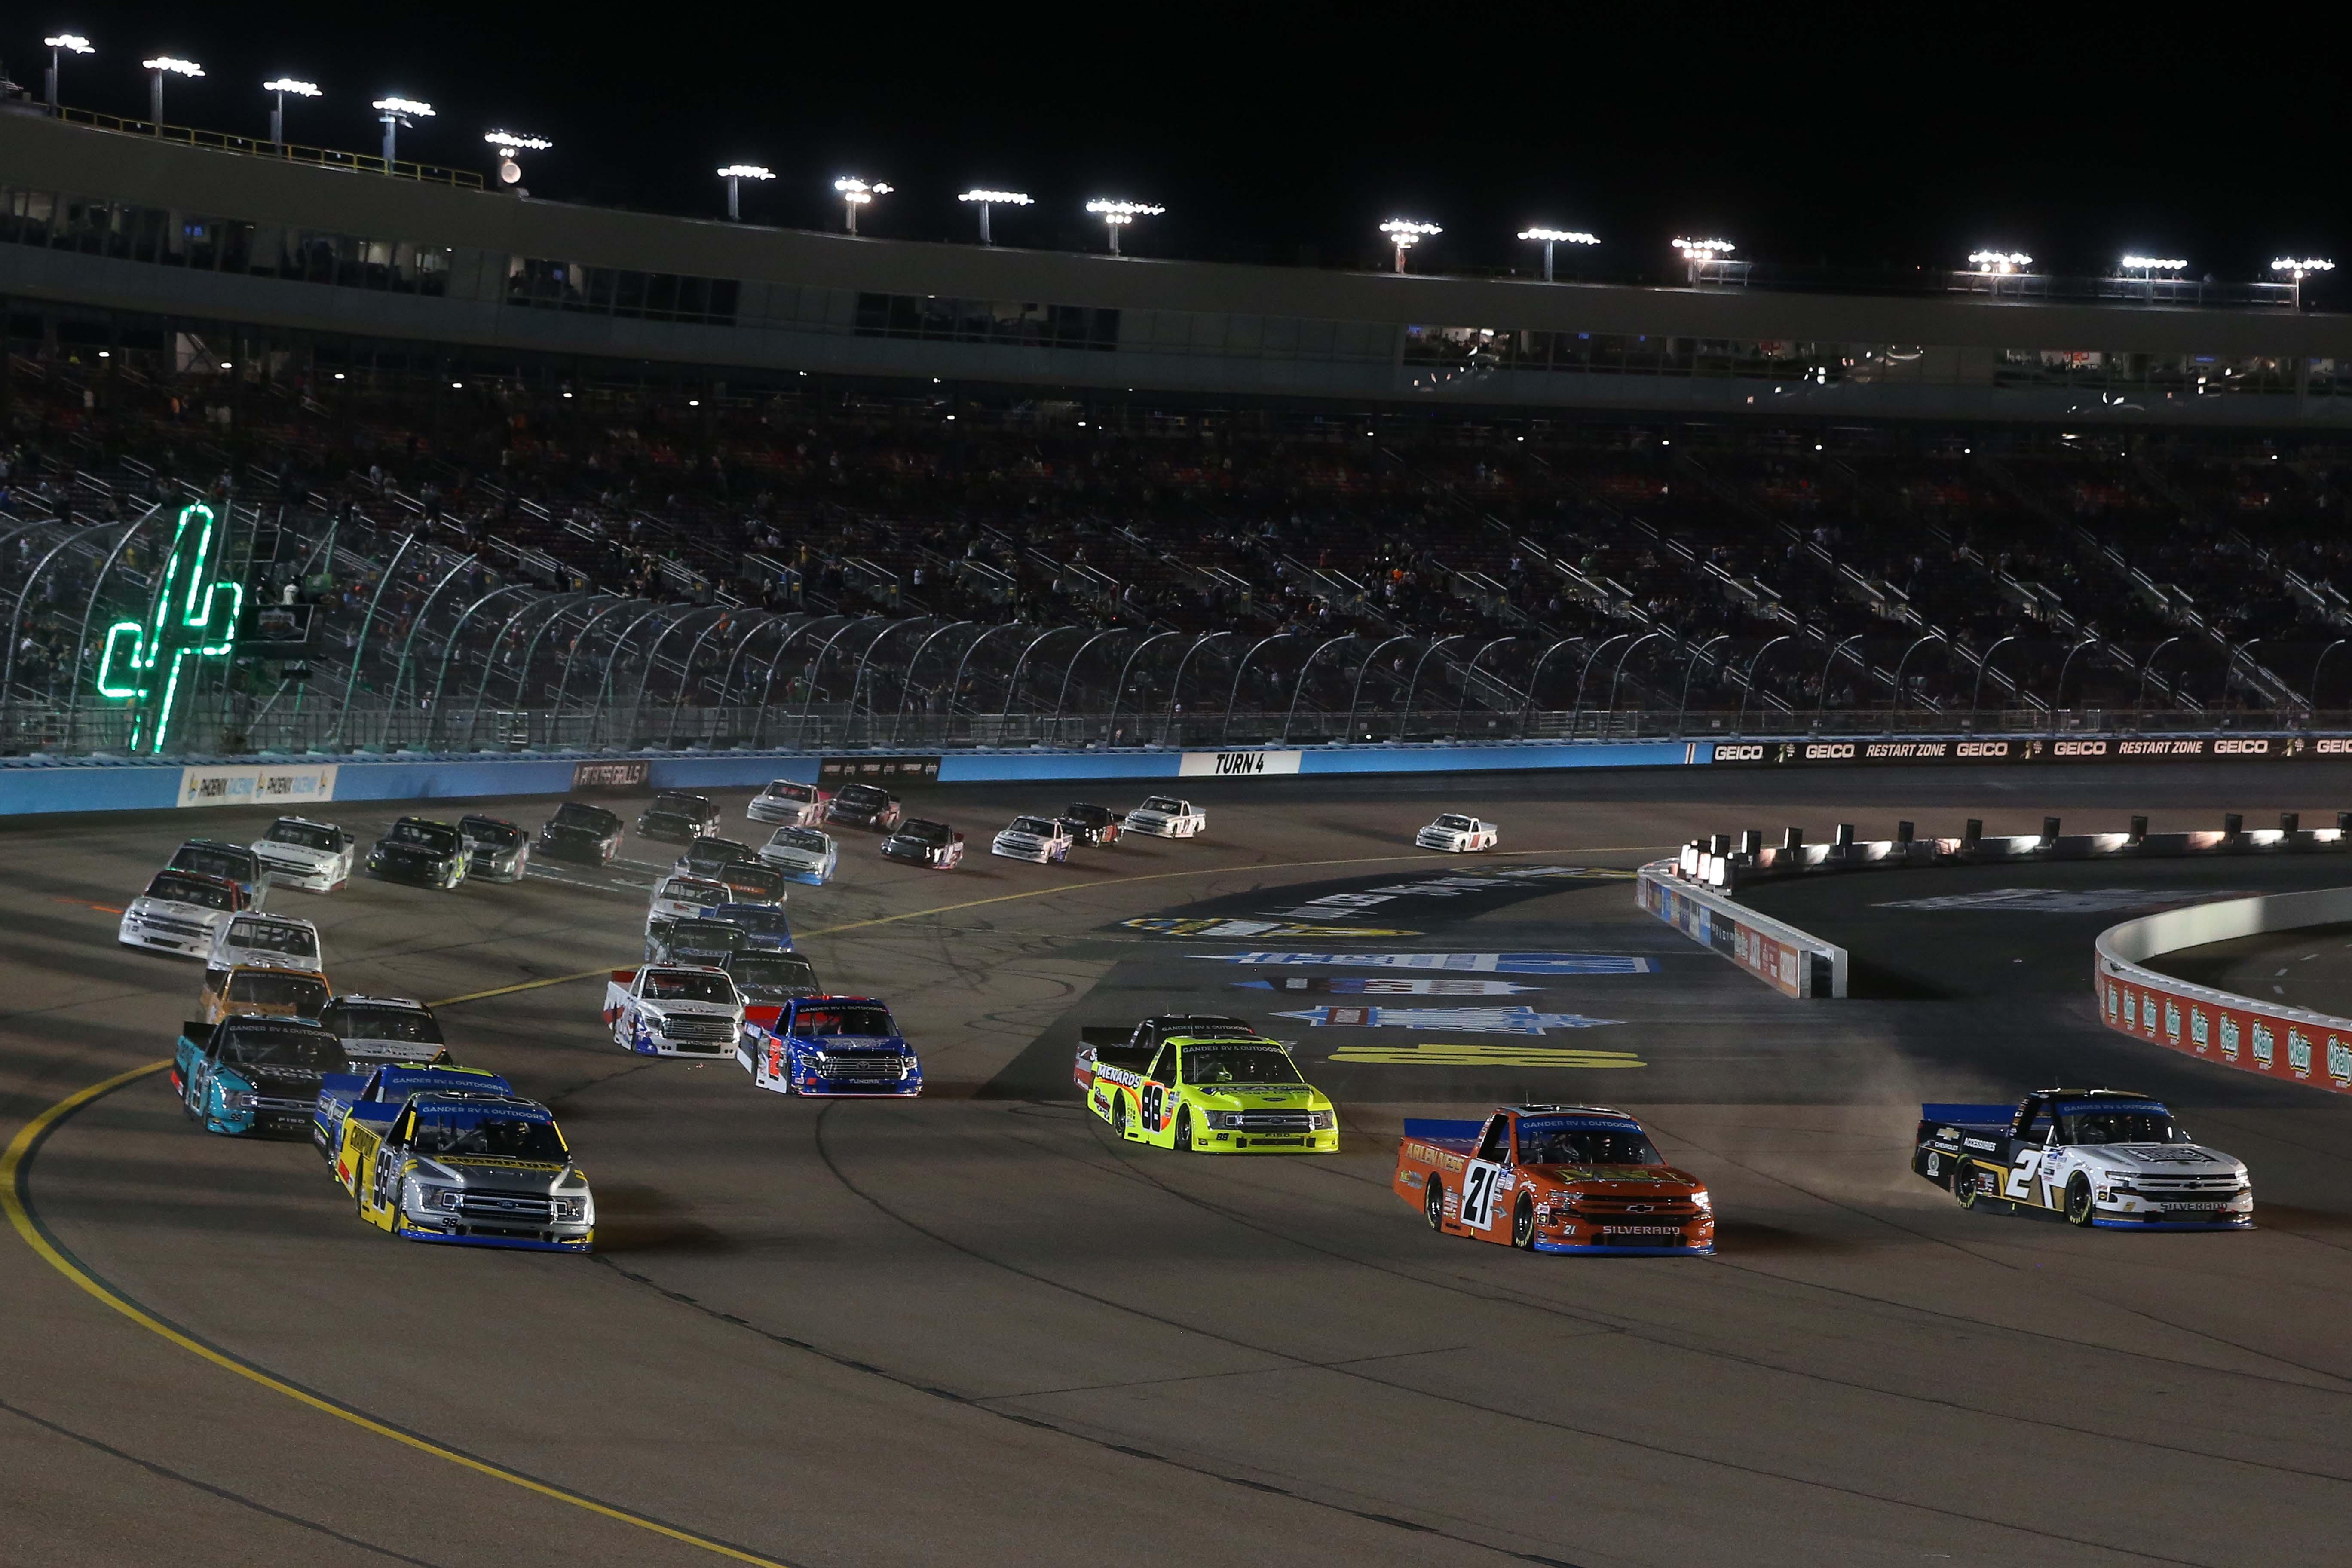 Grant Enfinger, Zane Smith, Sheldon Creed - Three wide at Phoenix Raceway - NASCAR Truck Series